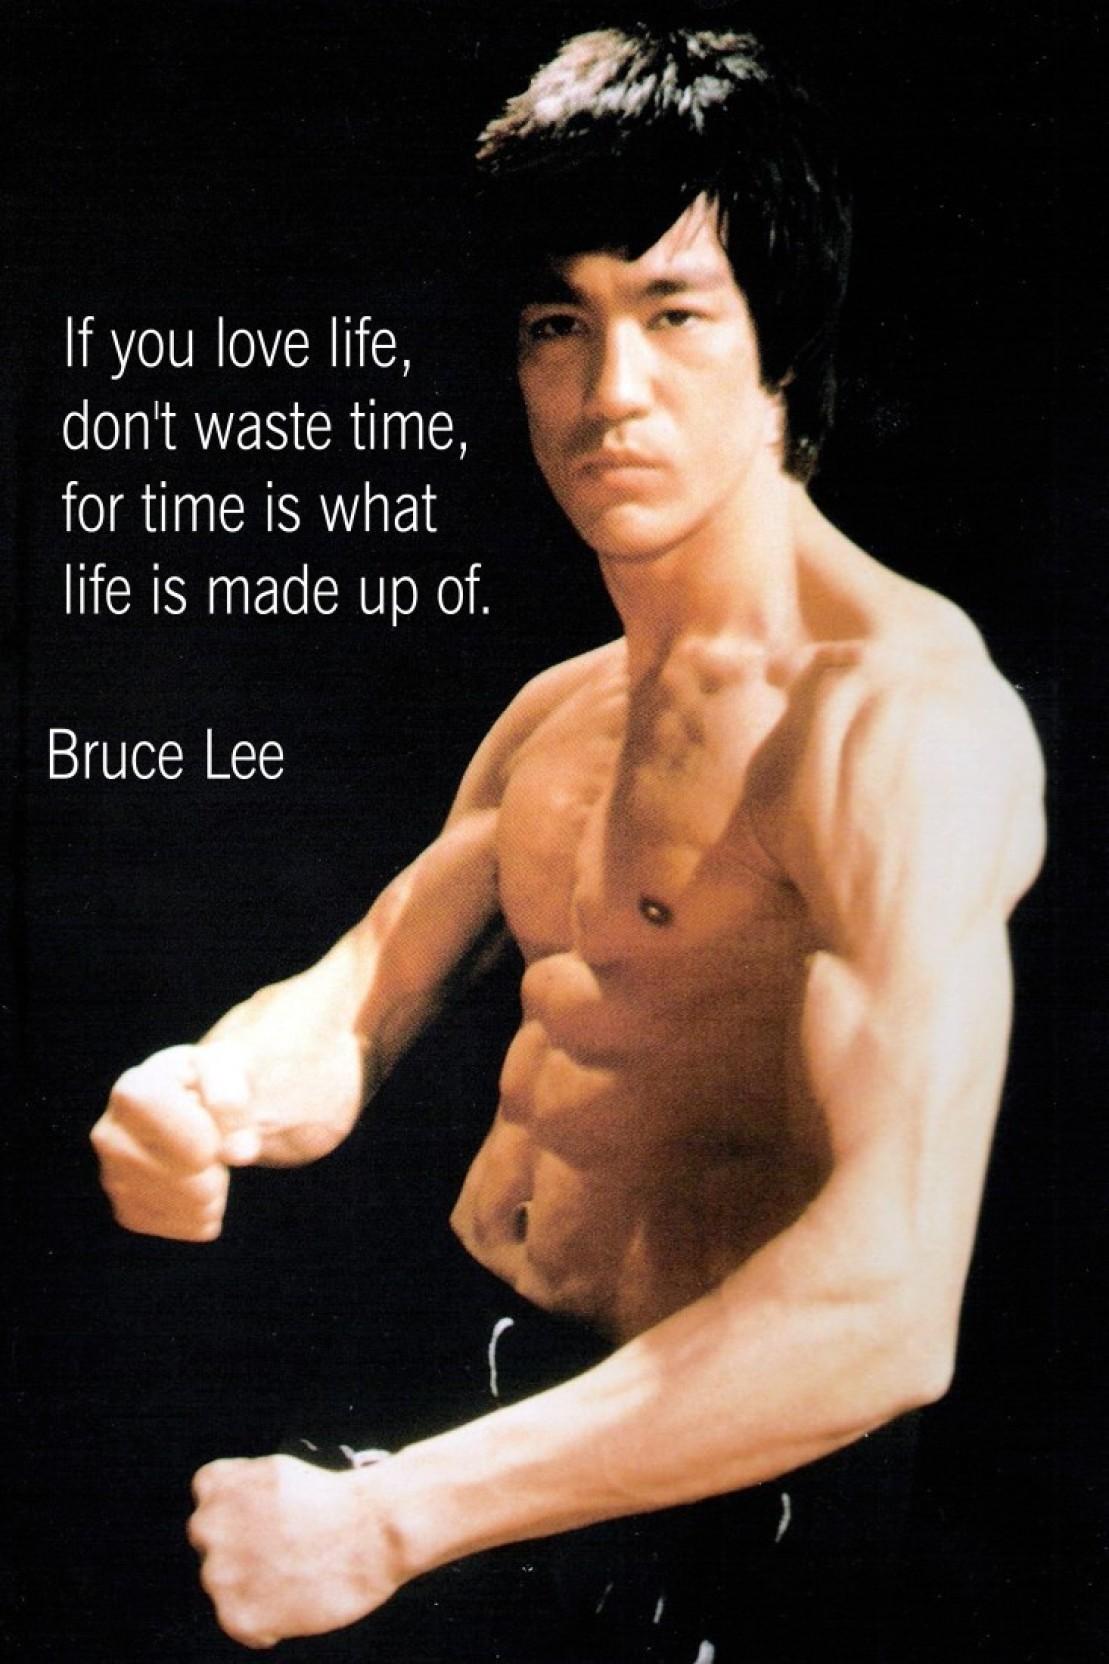 Bruce Lee Quotes Iphone 8 Case 004b419e65 Culturacuenca Com